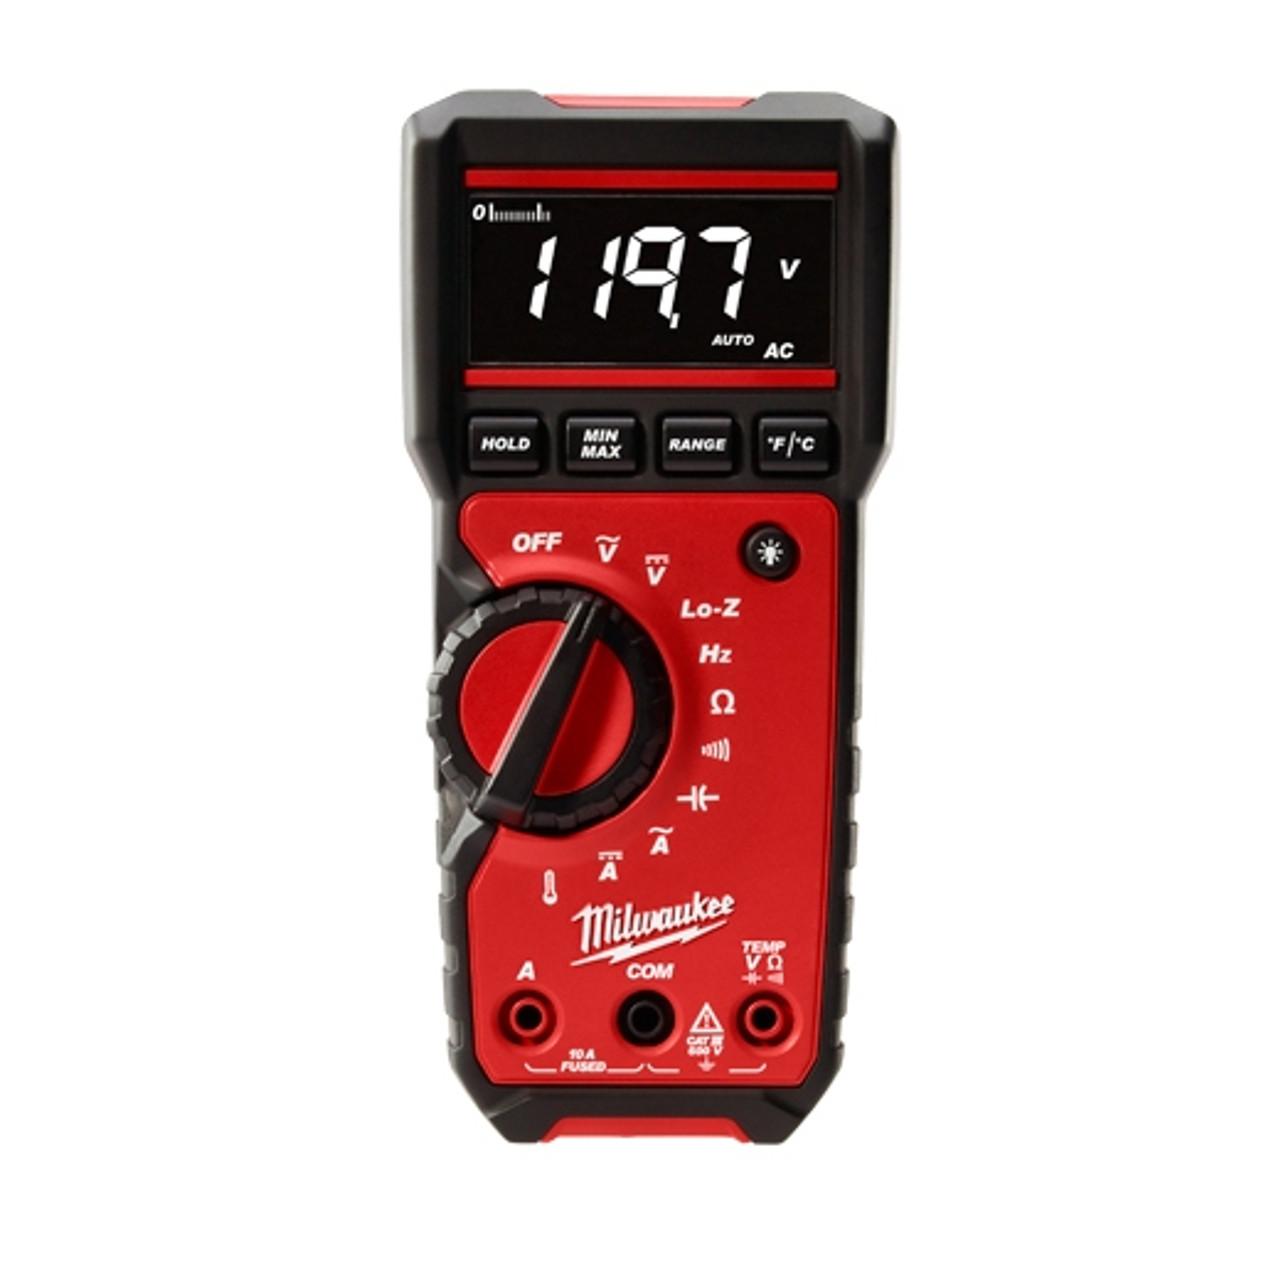 Milwaukee 2217-20 Digital Multimeter 6mV to 600V AC/600mV to 600V DC